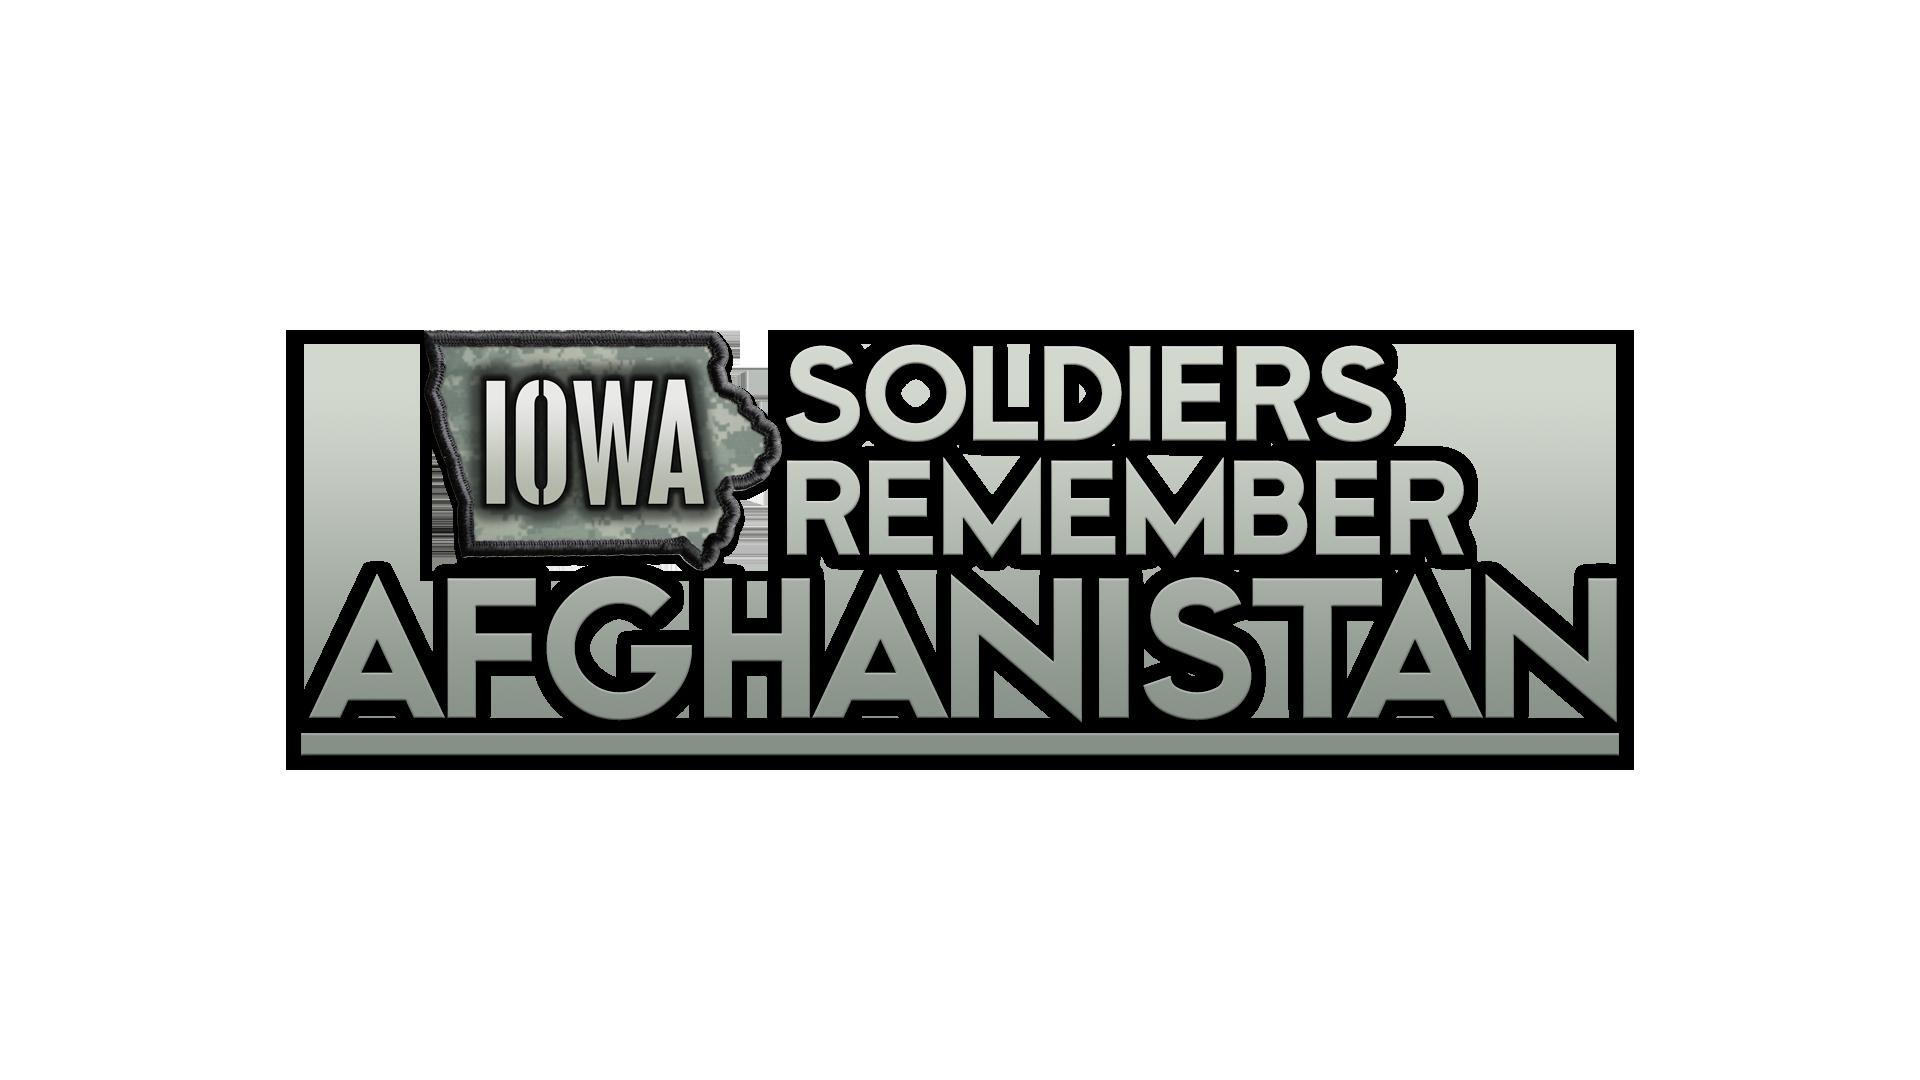 Iowa Soldiers Remember Afghanistan